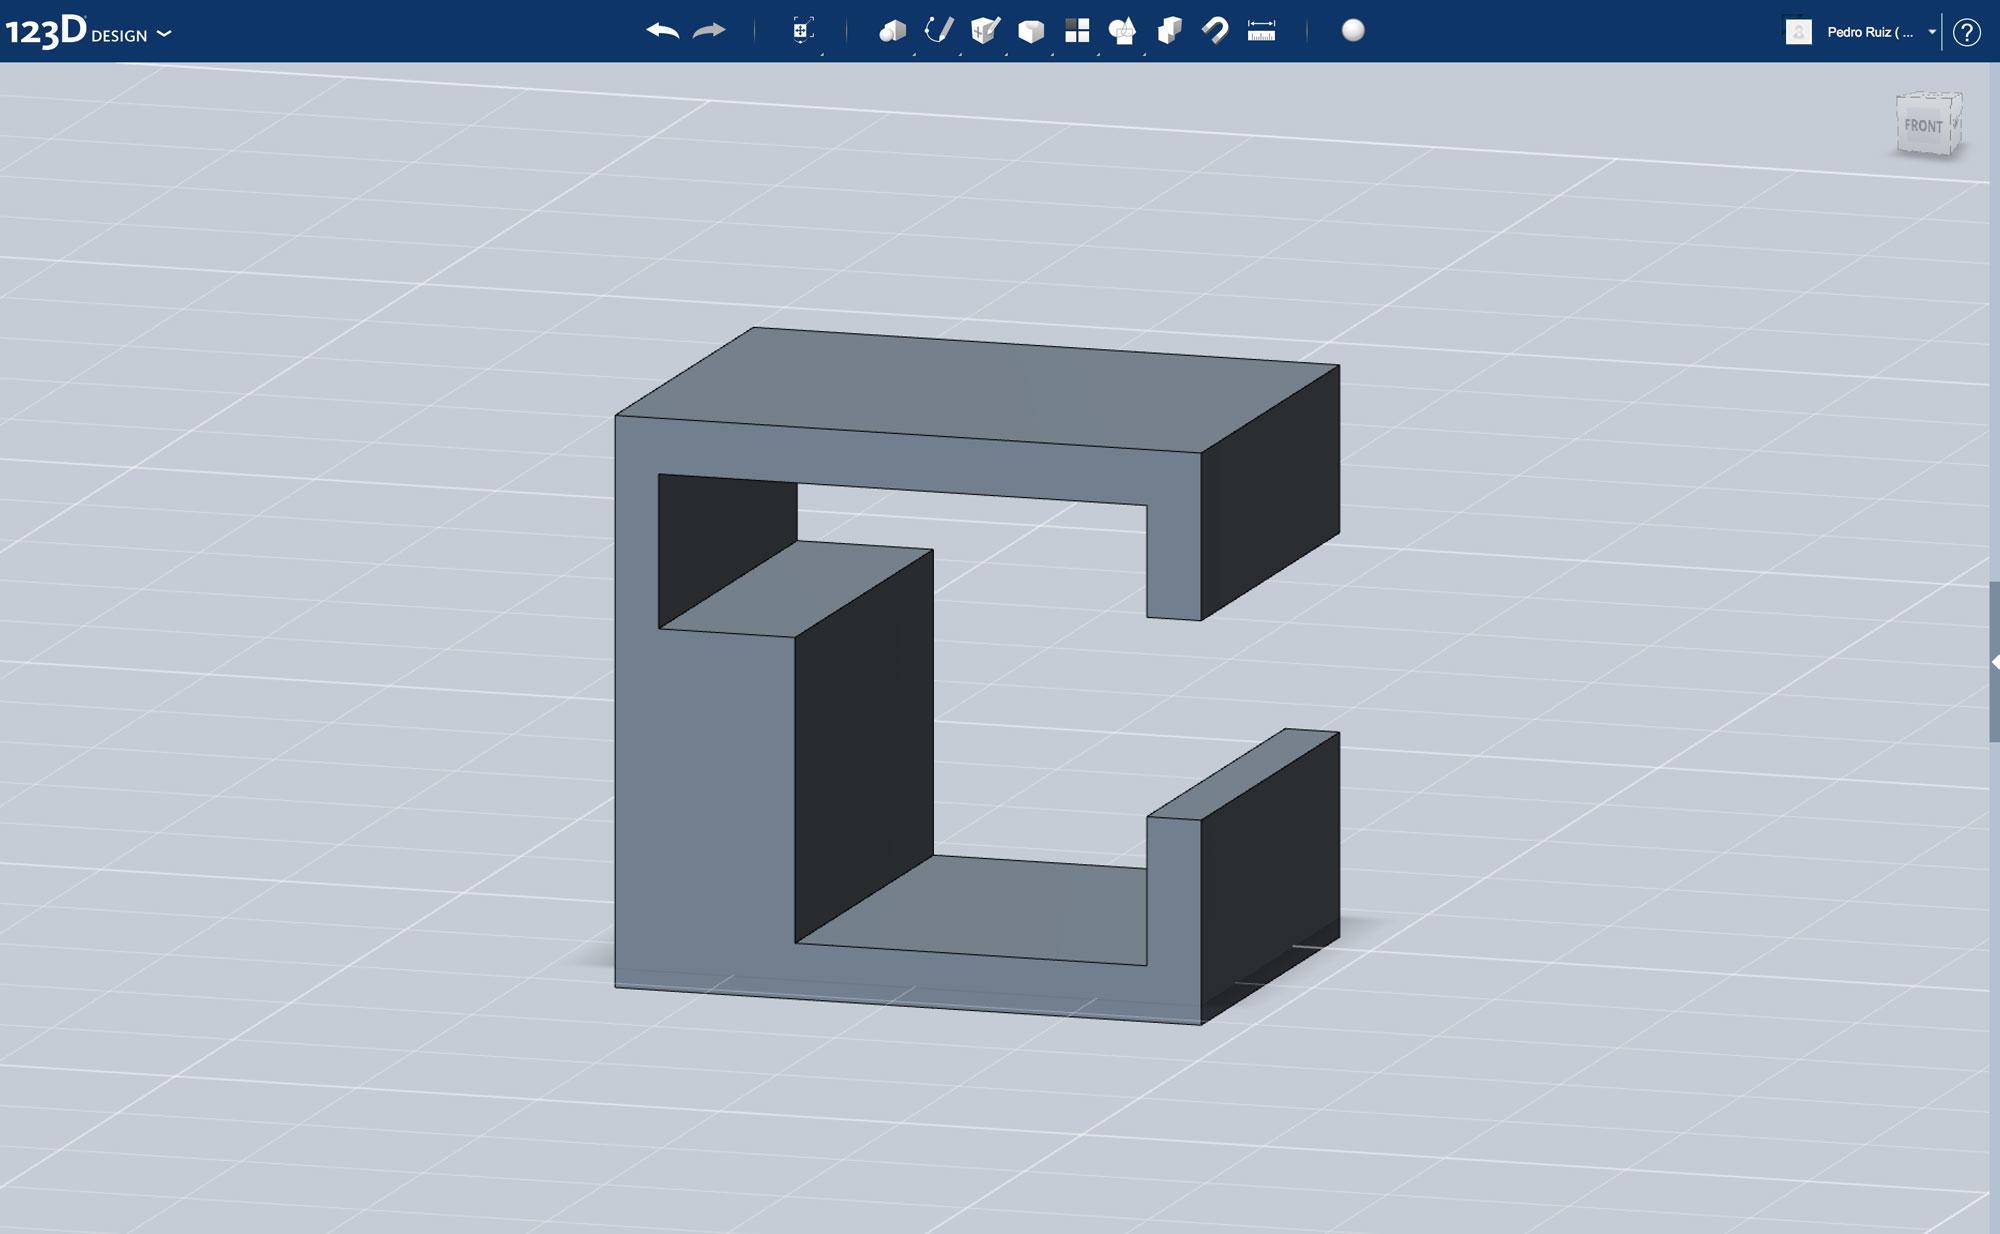 3d_printing_model1.jpg